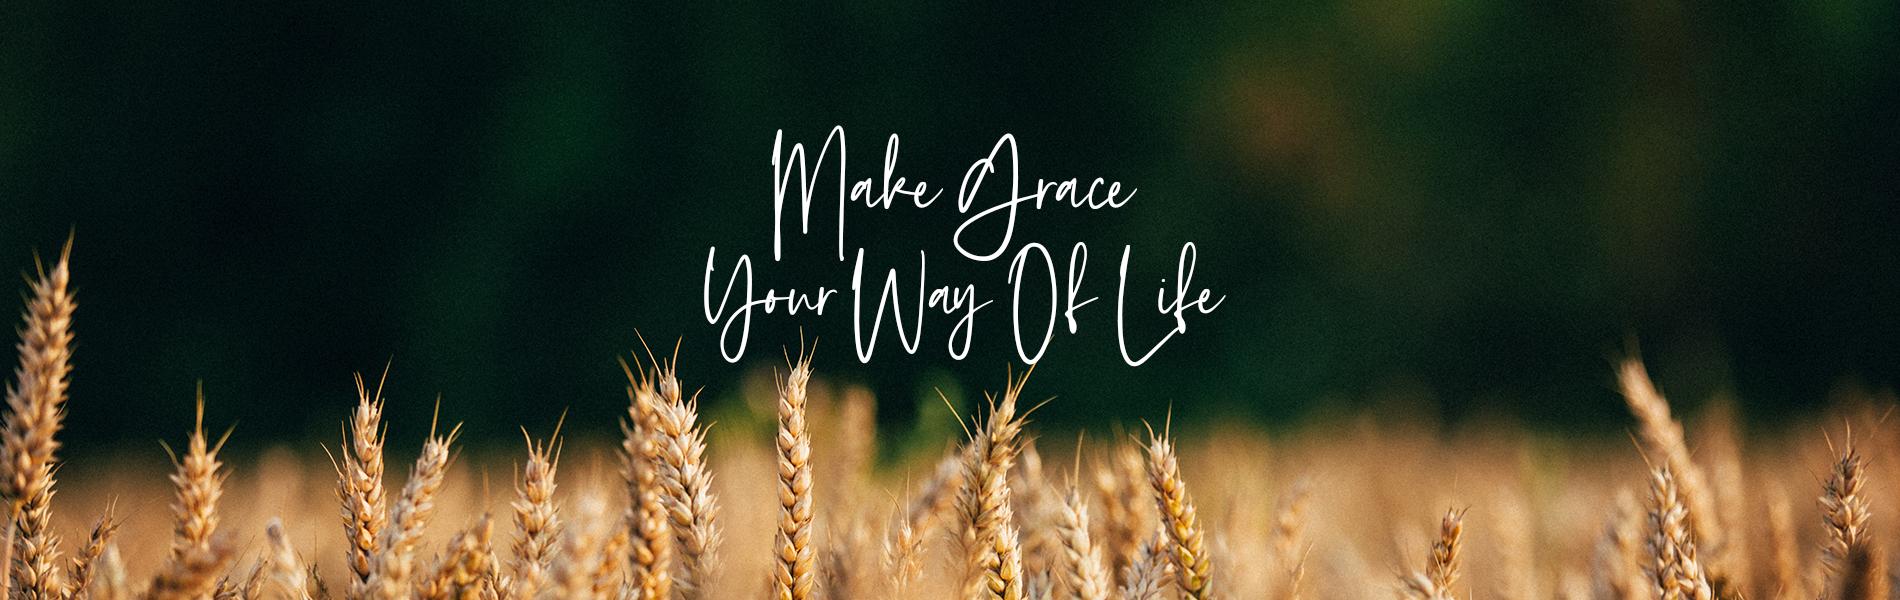 Apr_Make_Grace_Way_of_Life_EN New Creation TV   Broadcasting the Gospel of Jesus